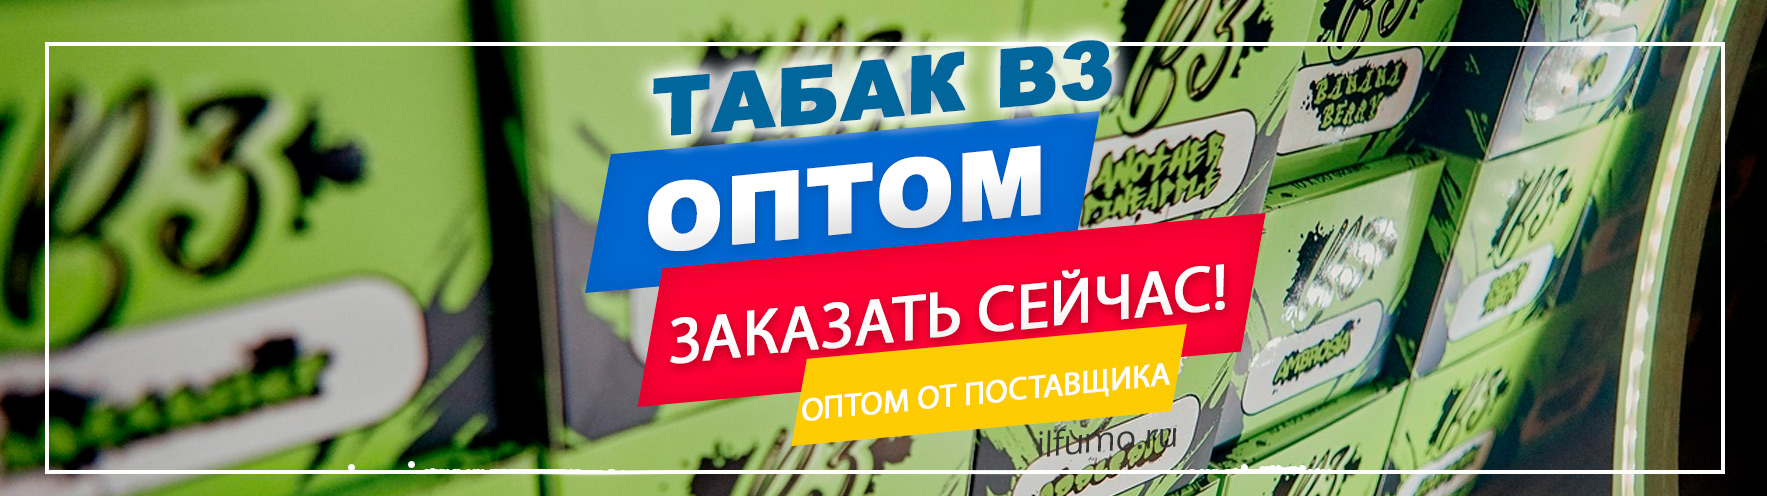 tabak b3 kupit optom v ilfumo - Табак B3